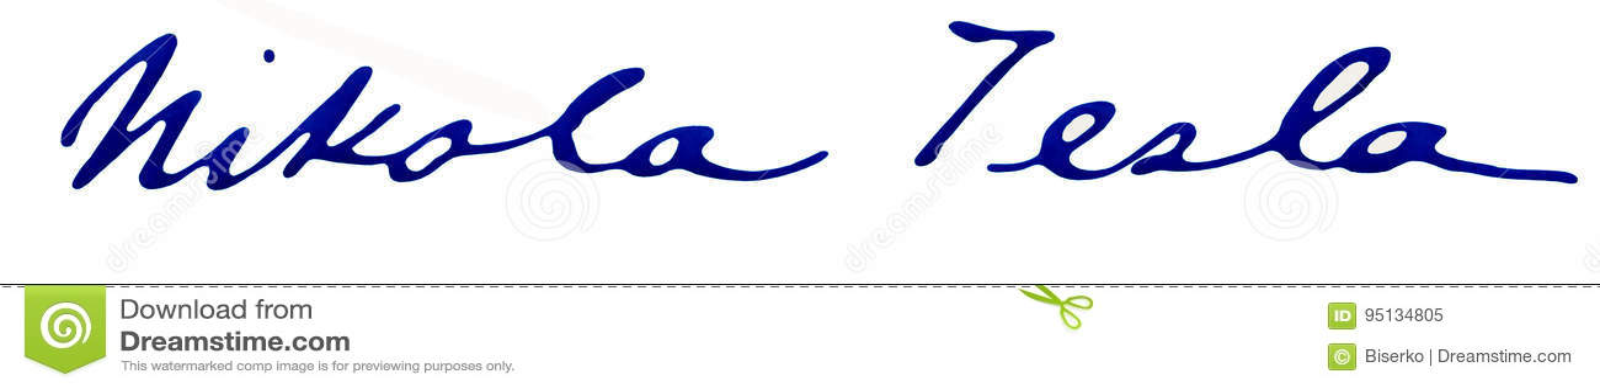 Nikola Tesla Autograph Editorial Image Image Of Physics 95134805